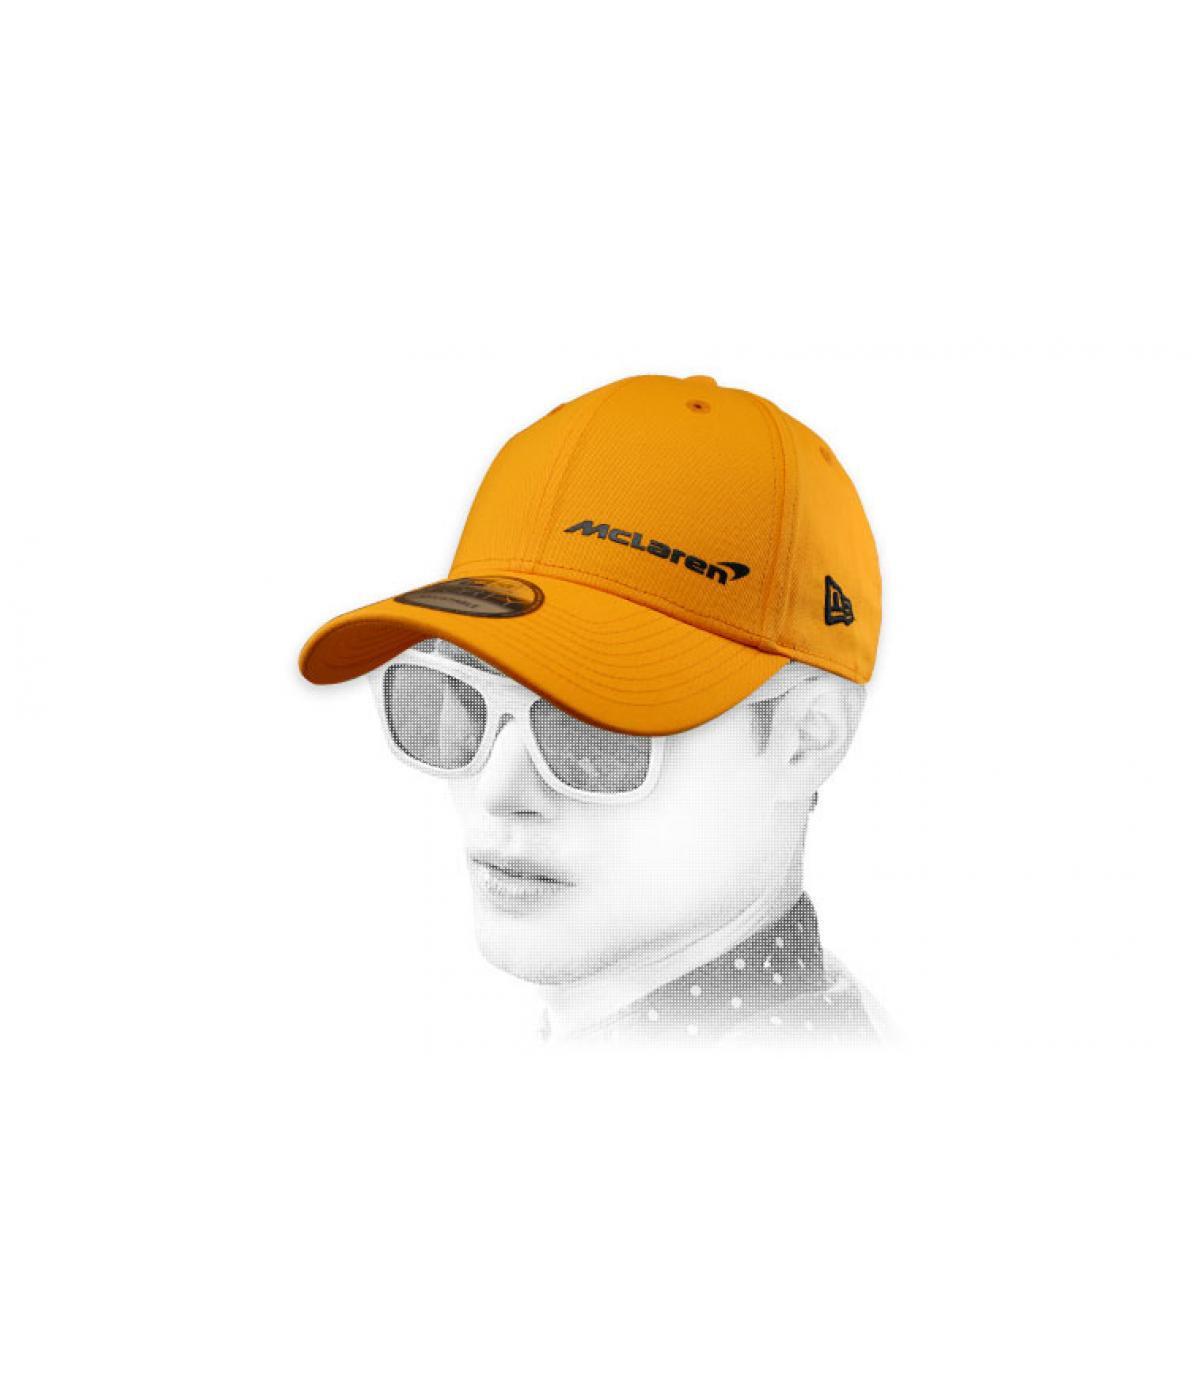 Cappellino McLaren giallo